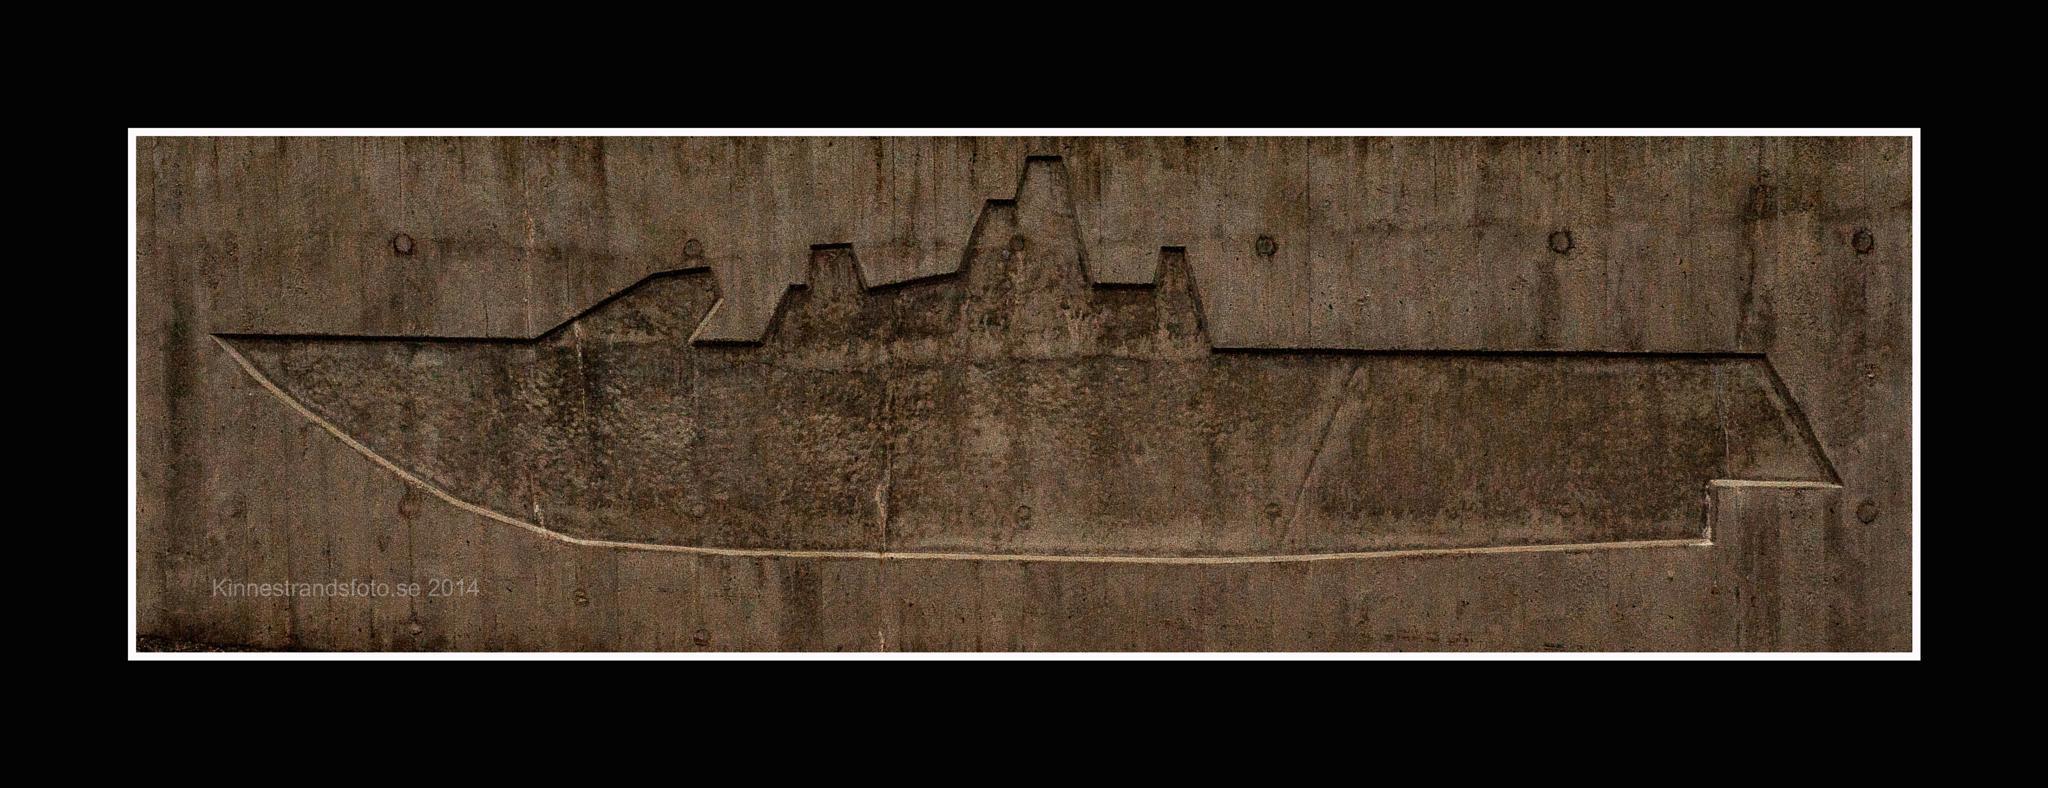 concrete boat by Hakan kinnestrand